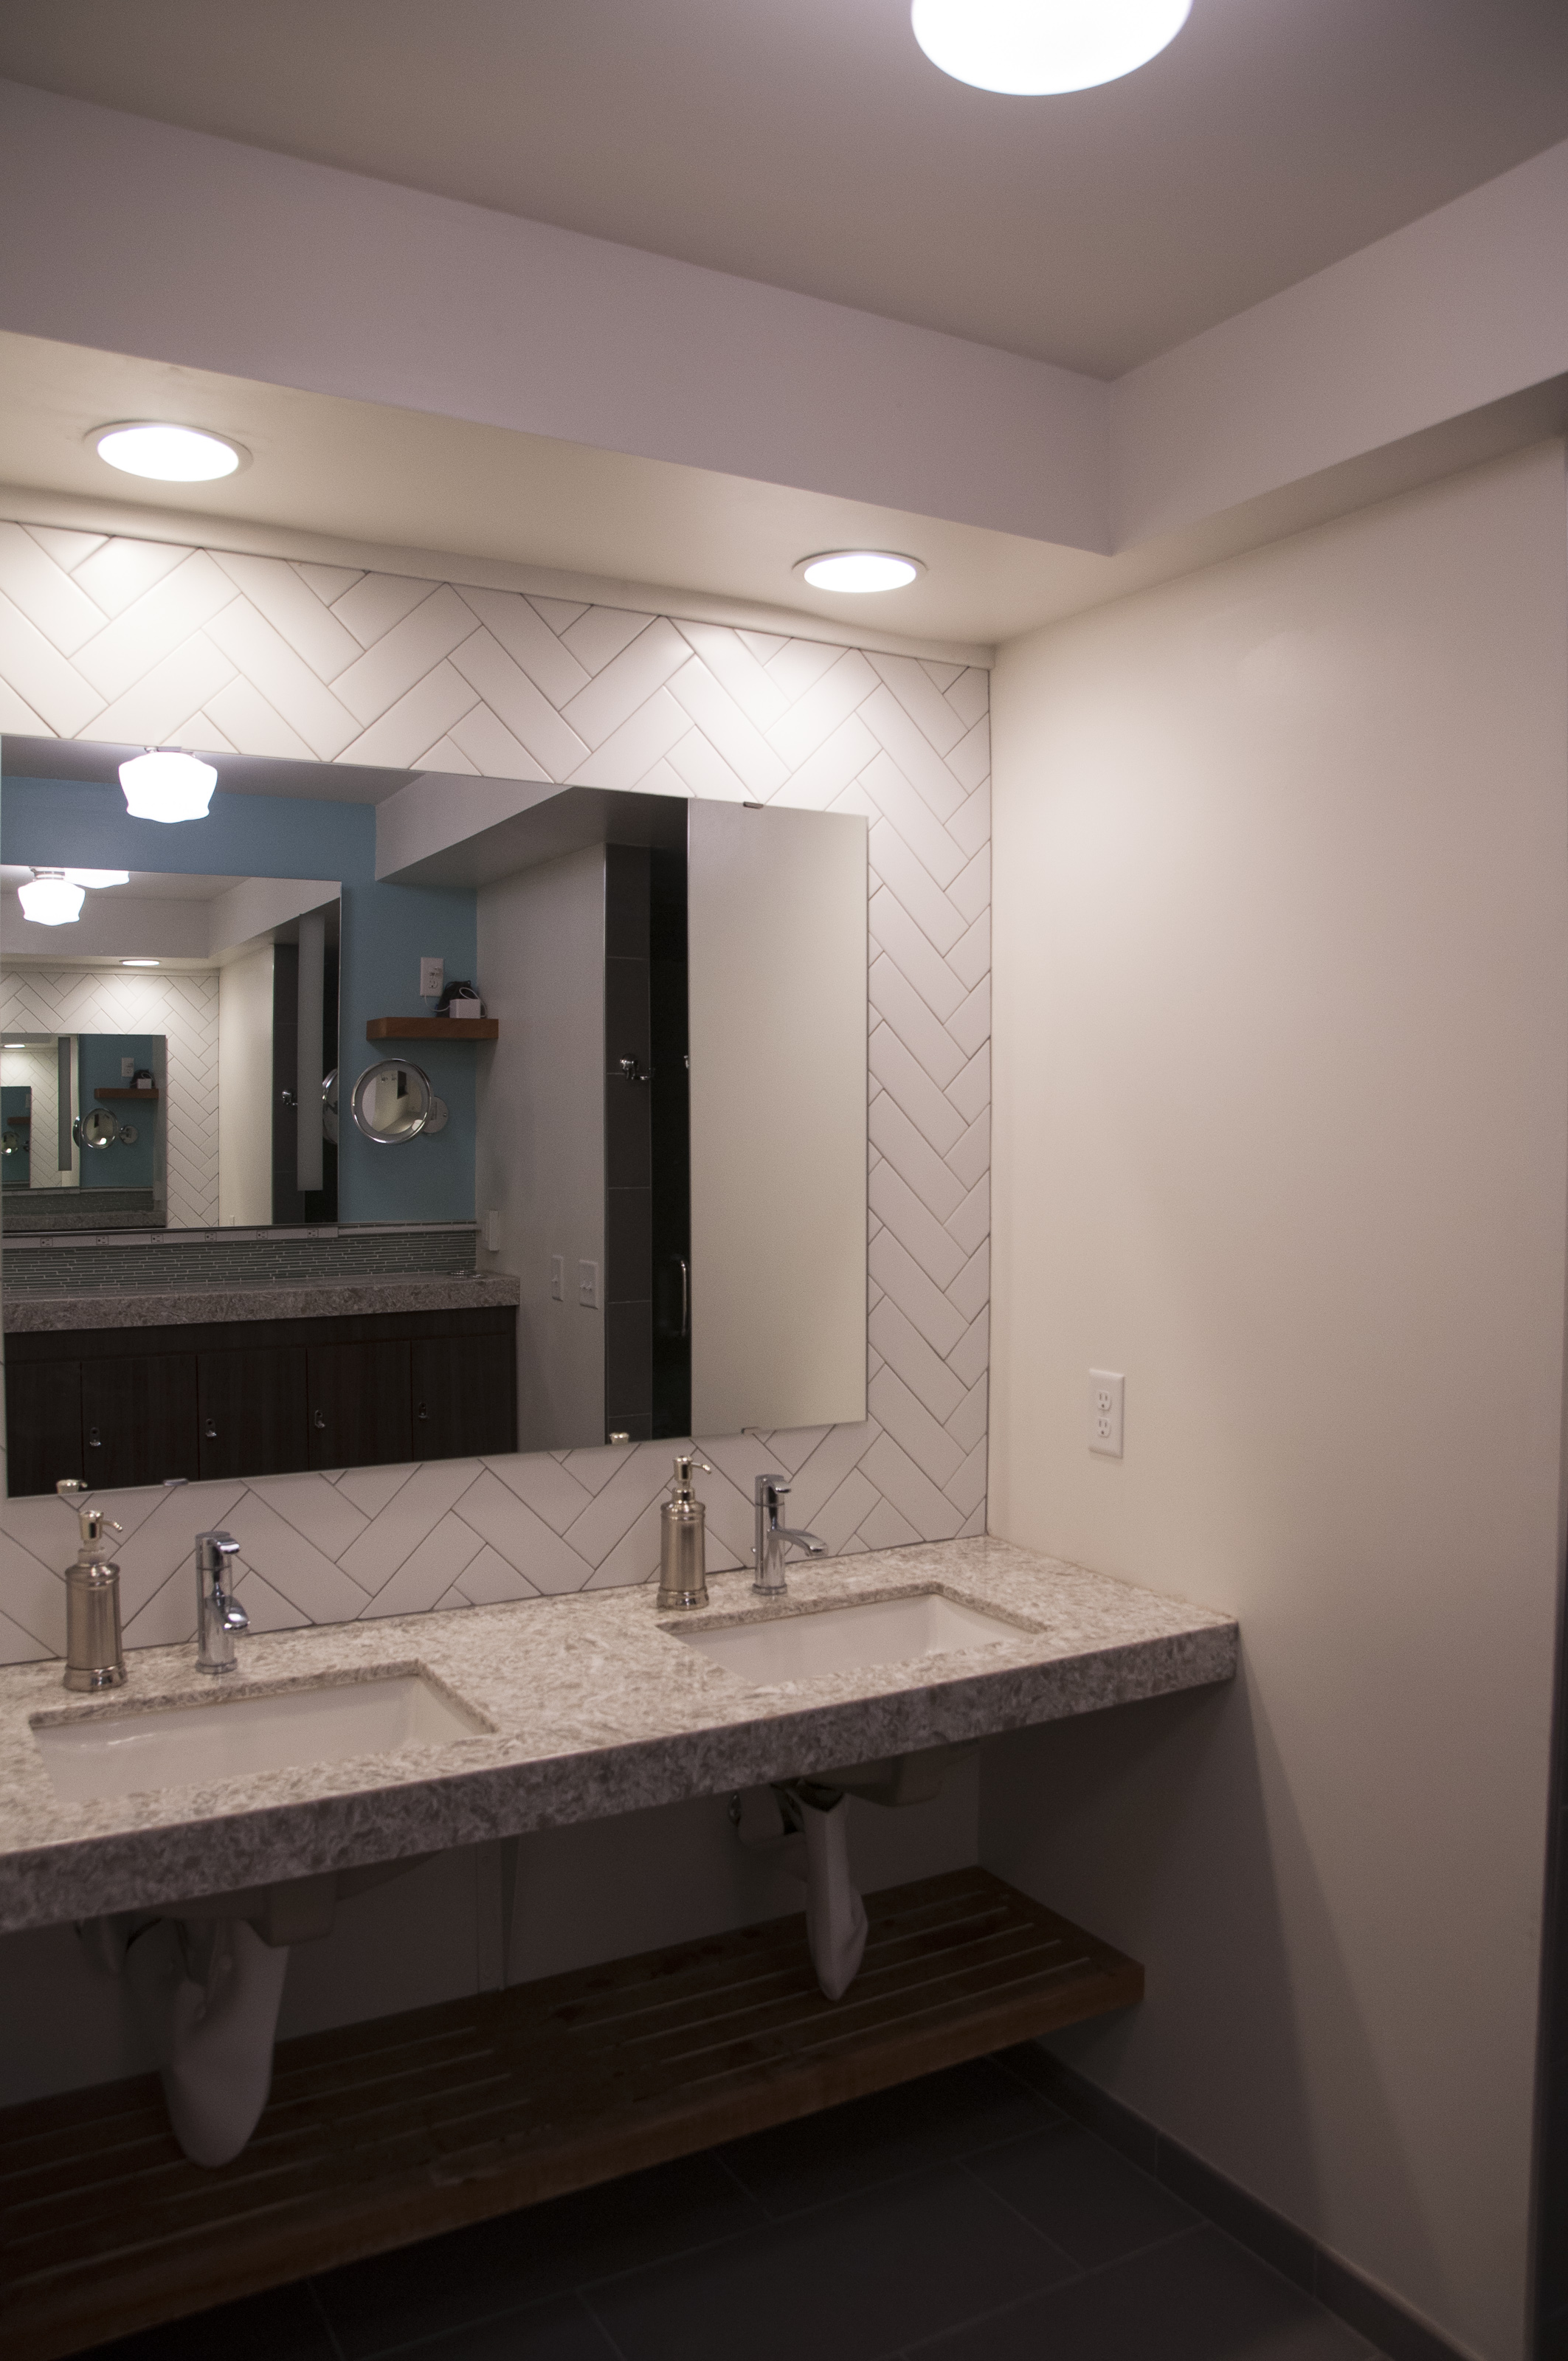 Interiors_AlphaPhi_Bathroom-16.jpg